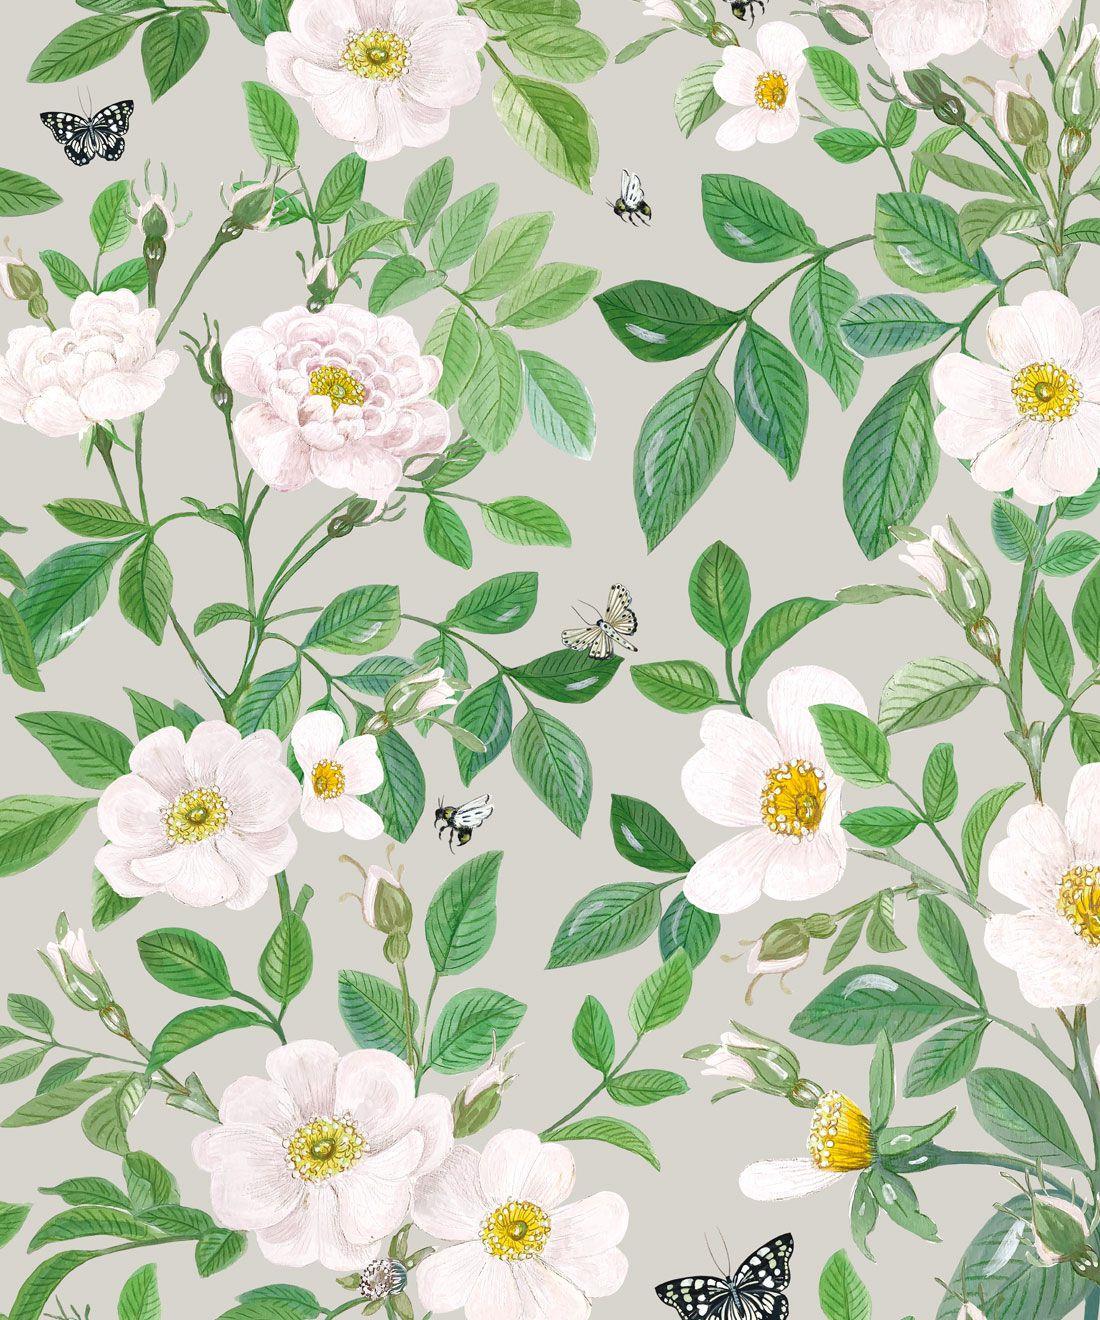 Rosa Wallpaper • Floral Wallpaper • Beige • Swatch